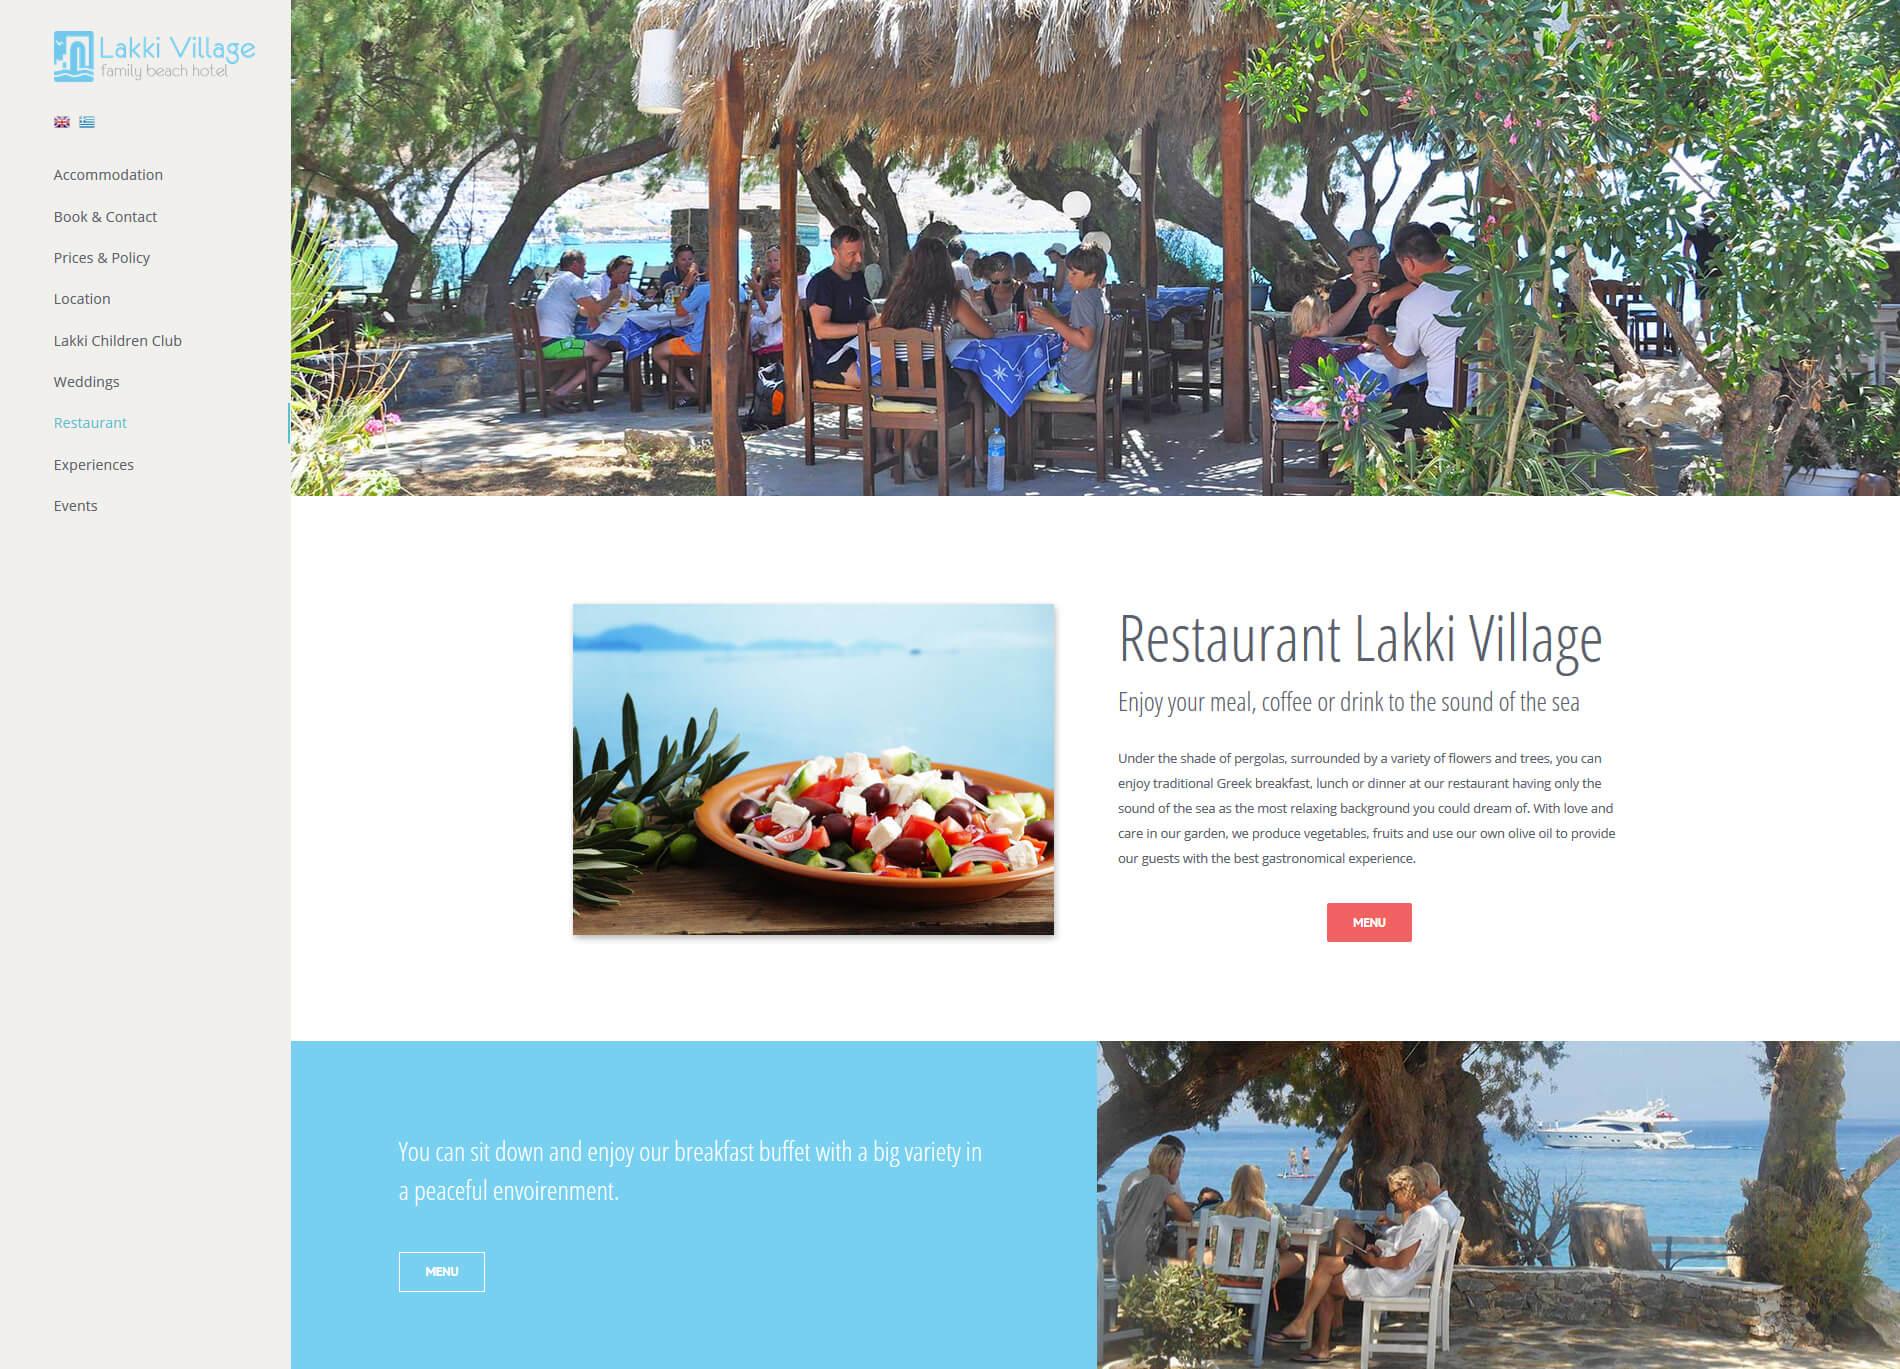 Web design anweb Lakki Village Family Beach Hotel